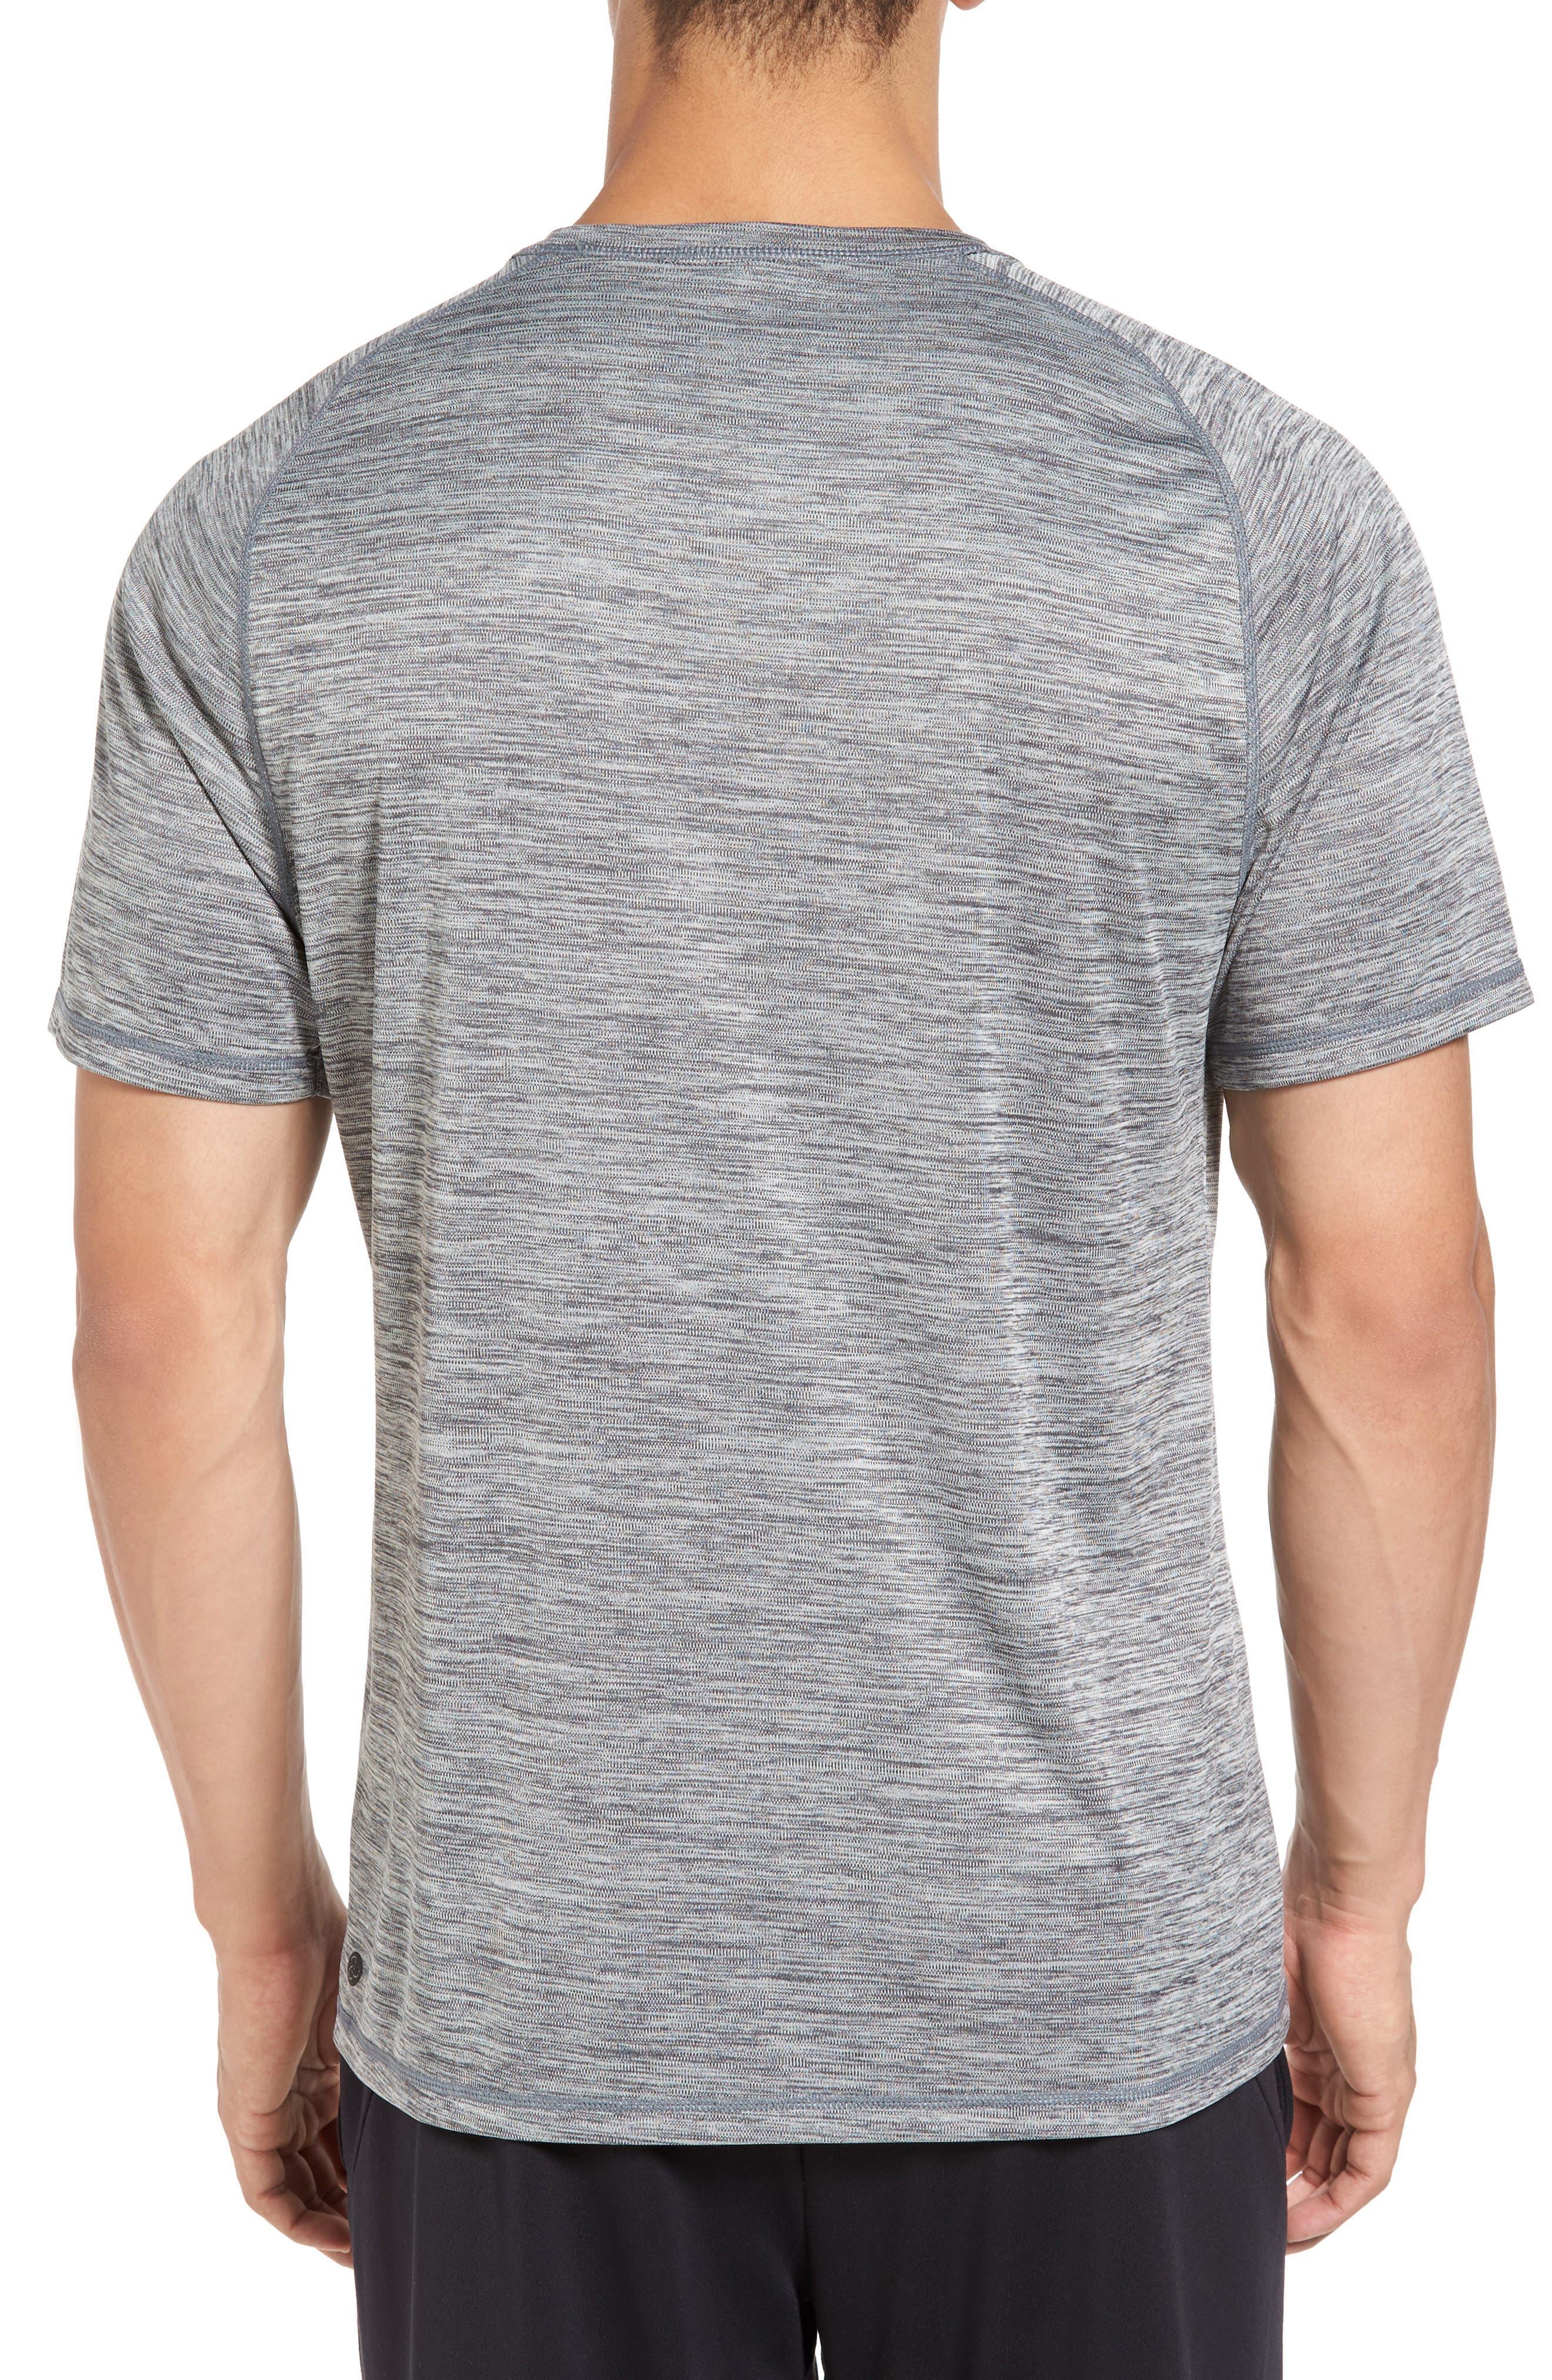 Triplite T-Shirt,                             Alternate thumbnail 19, color,